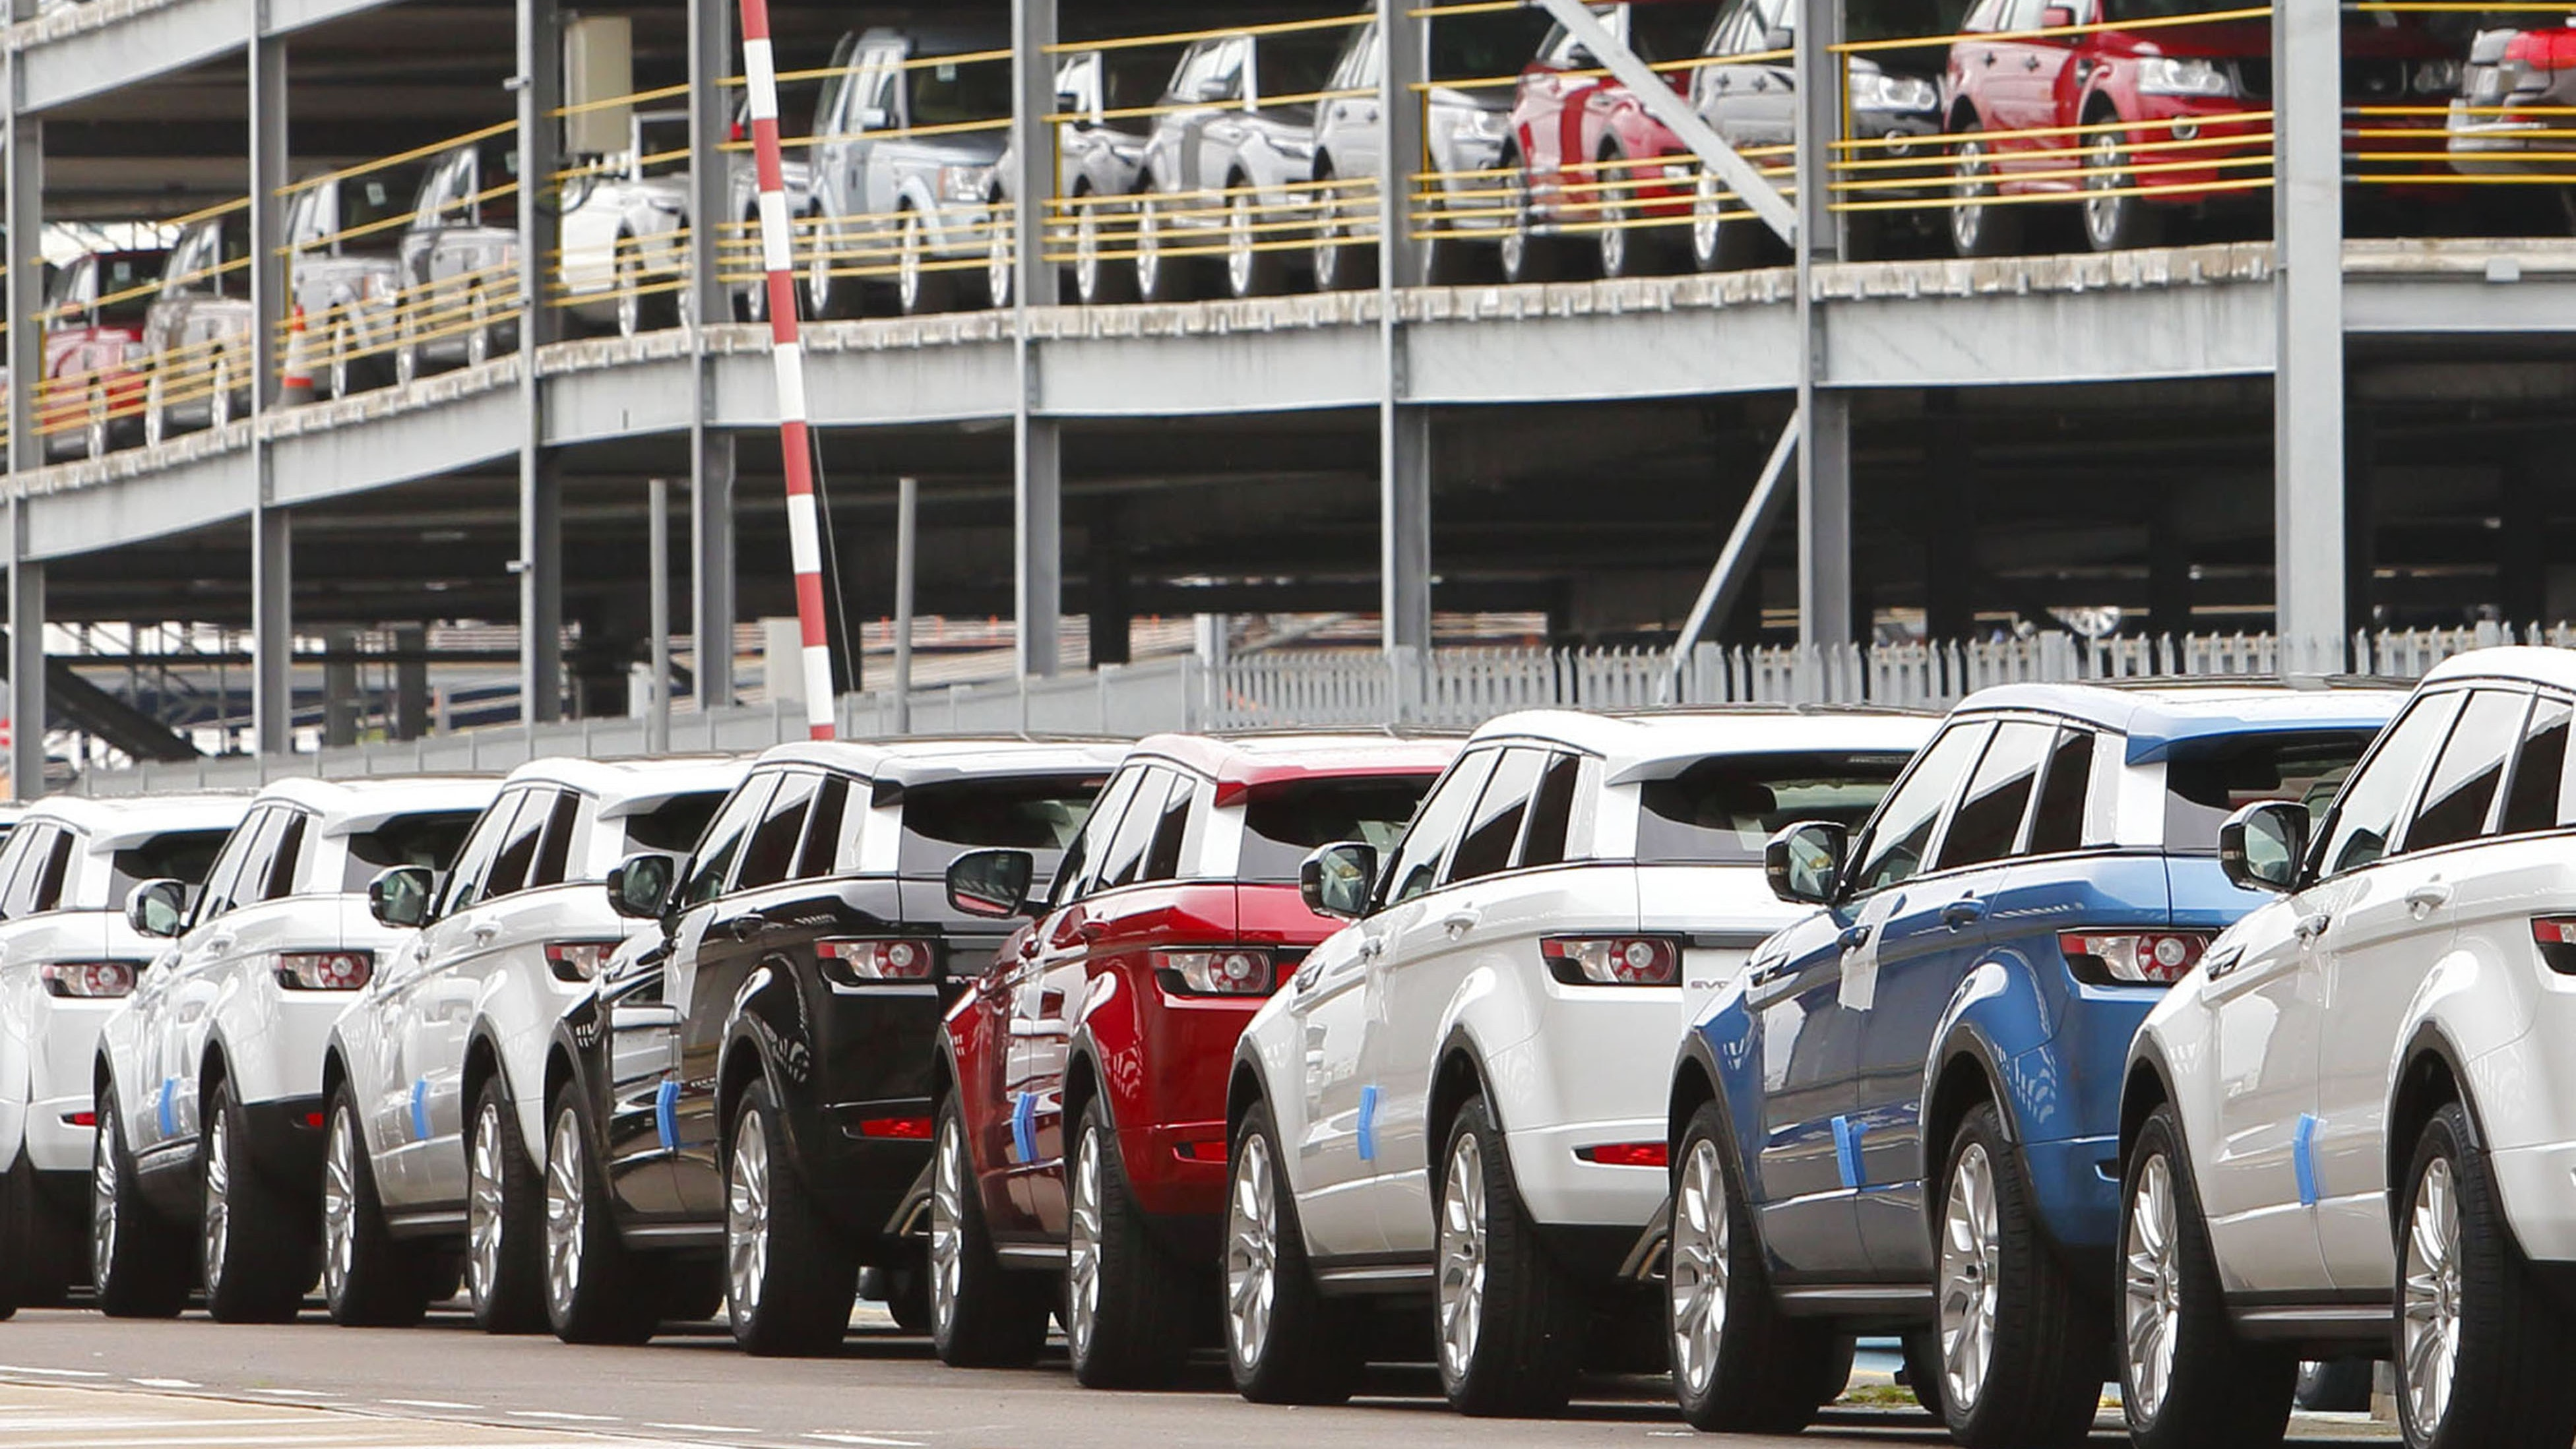 Land Rover wins case over copycat Evoque